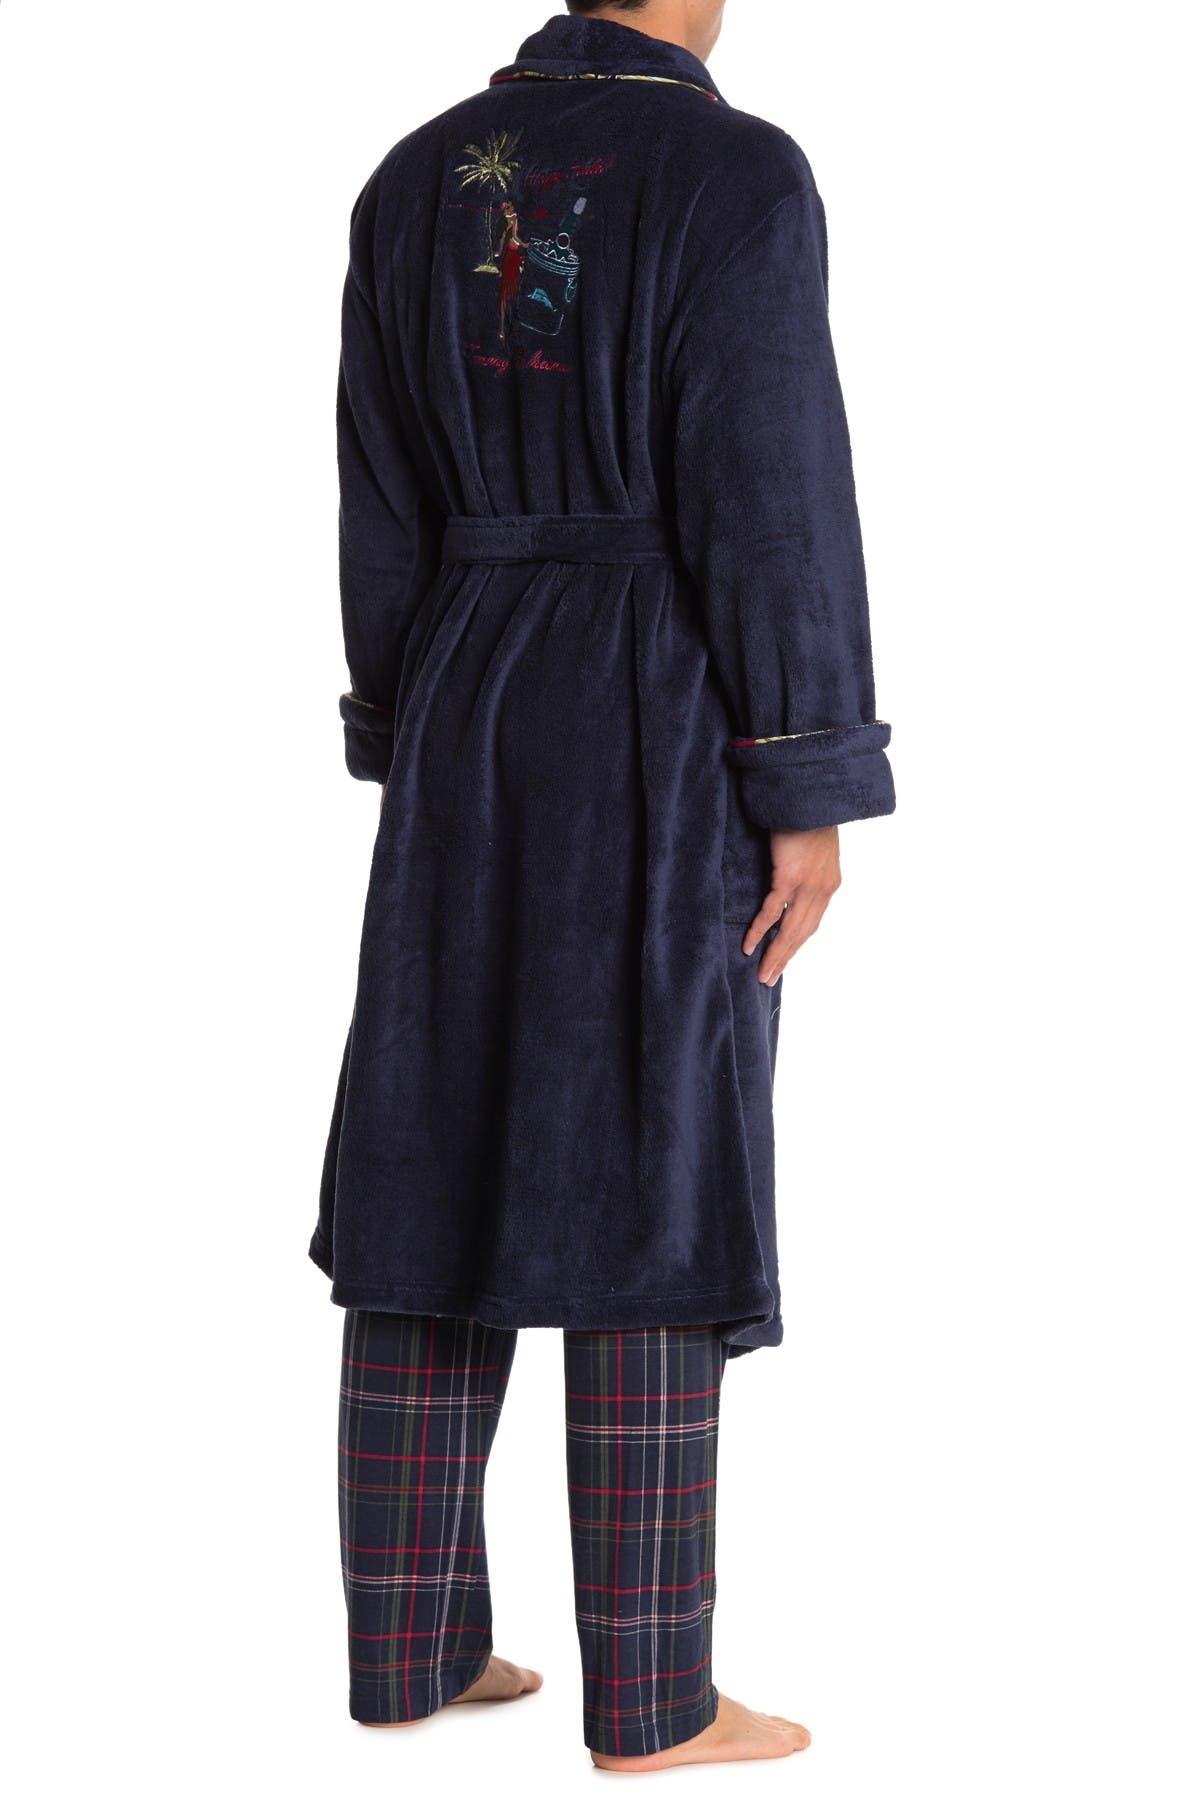 Image of Tommy Bahama Embroidered Back Plush Fleece Robe